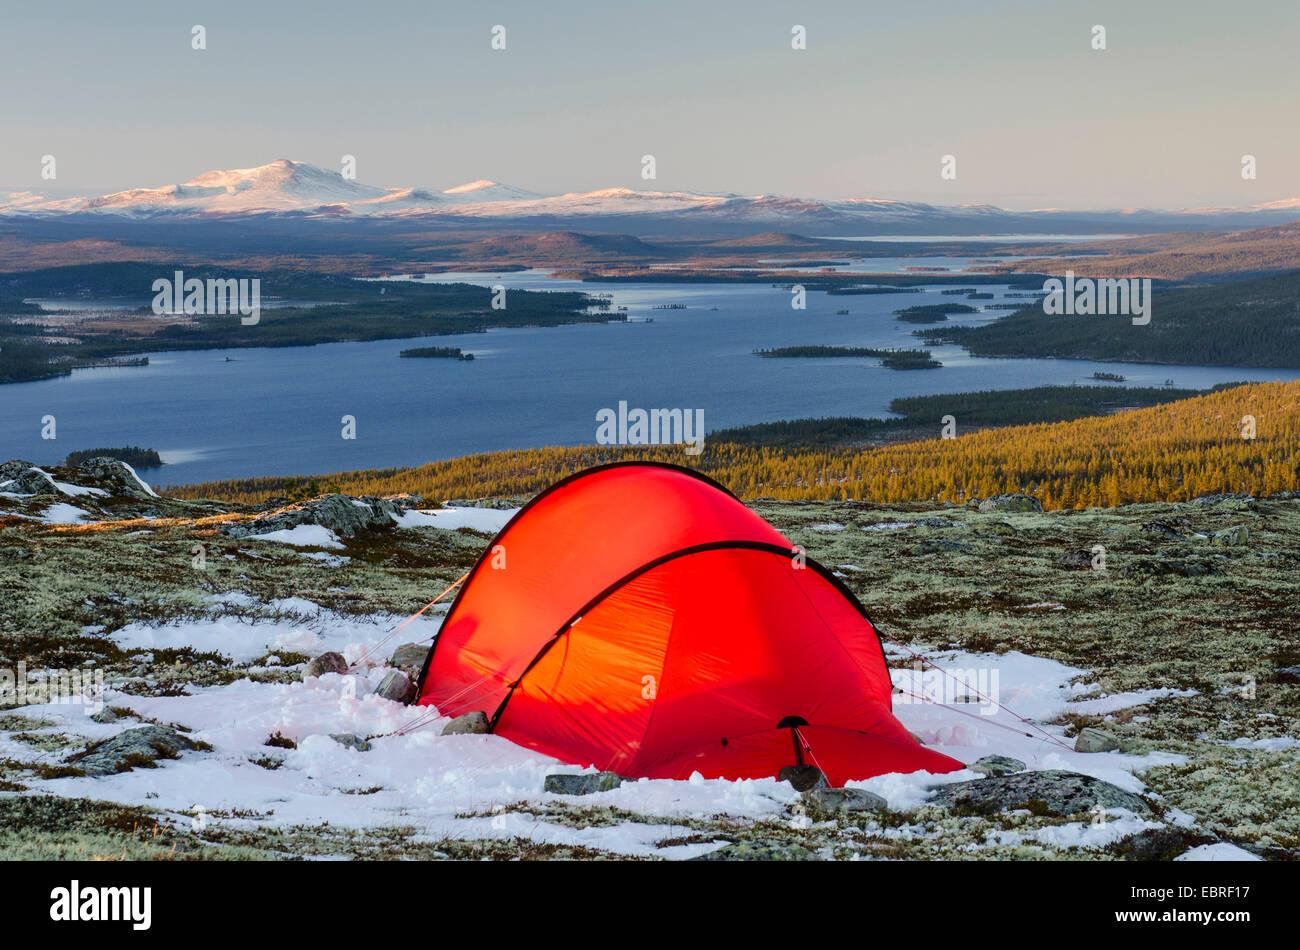 Zelt auf einem Berg mit Panoramablick auf den See Isteren, Norwegen, Hedmark Fylke, Engerdalsfjellet Stockbild